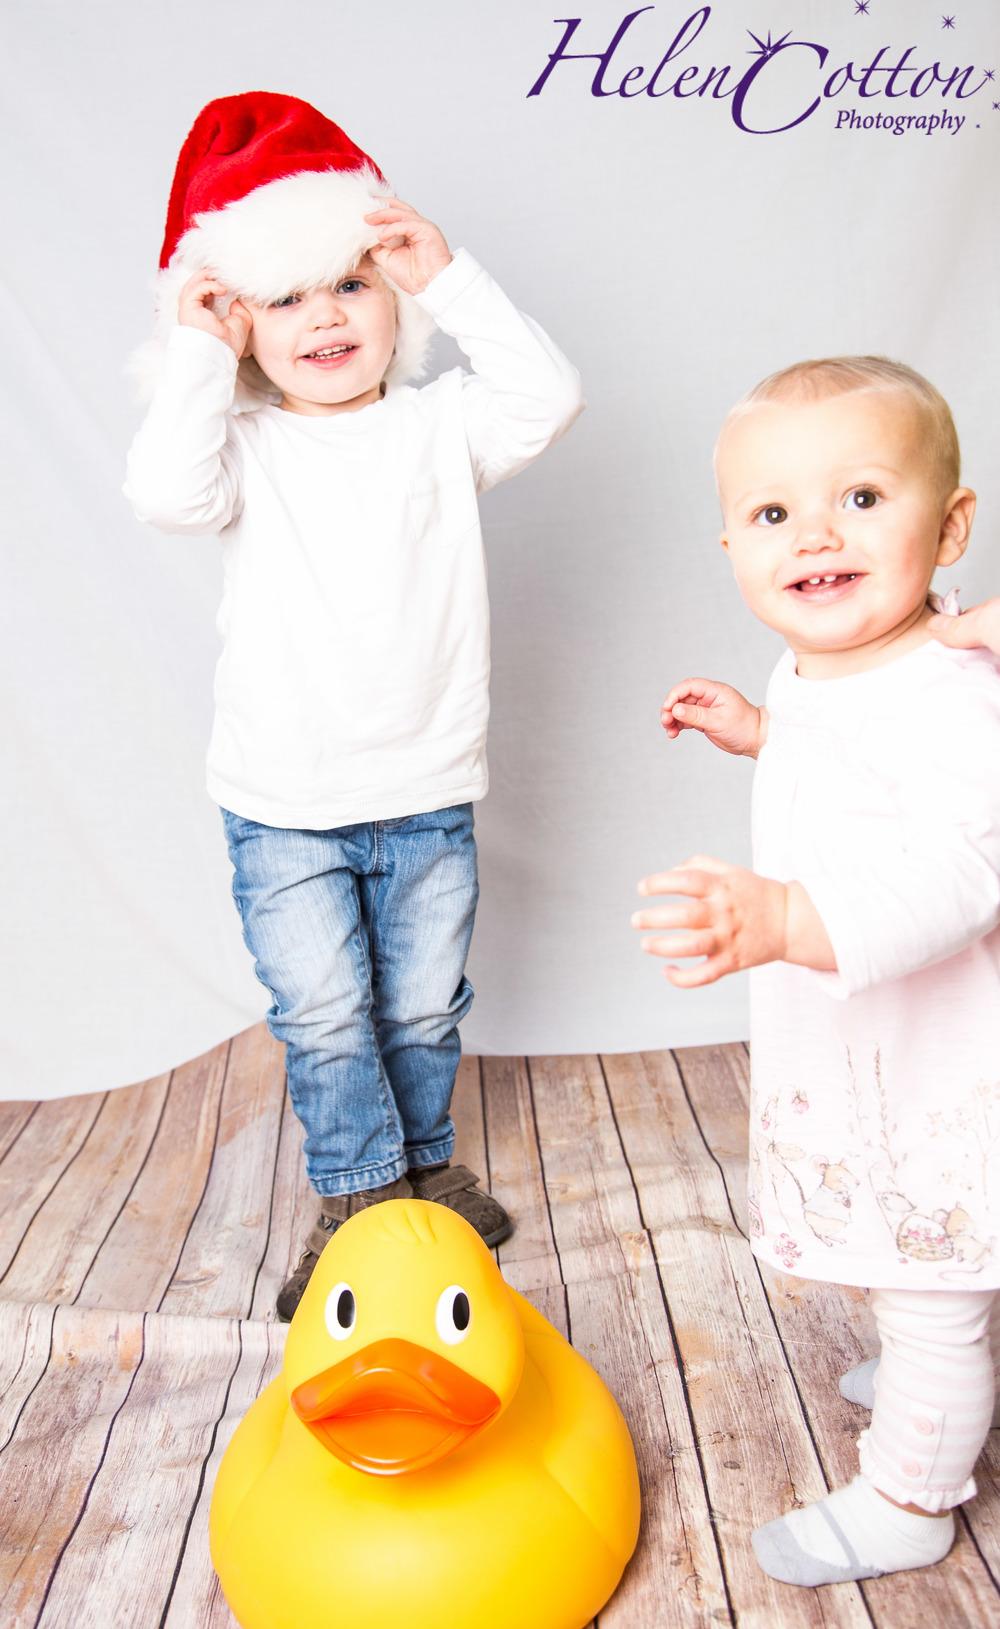 Cotton Family_helen_Cotton_Photography©-11.jpg